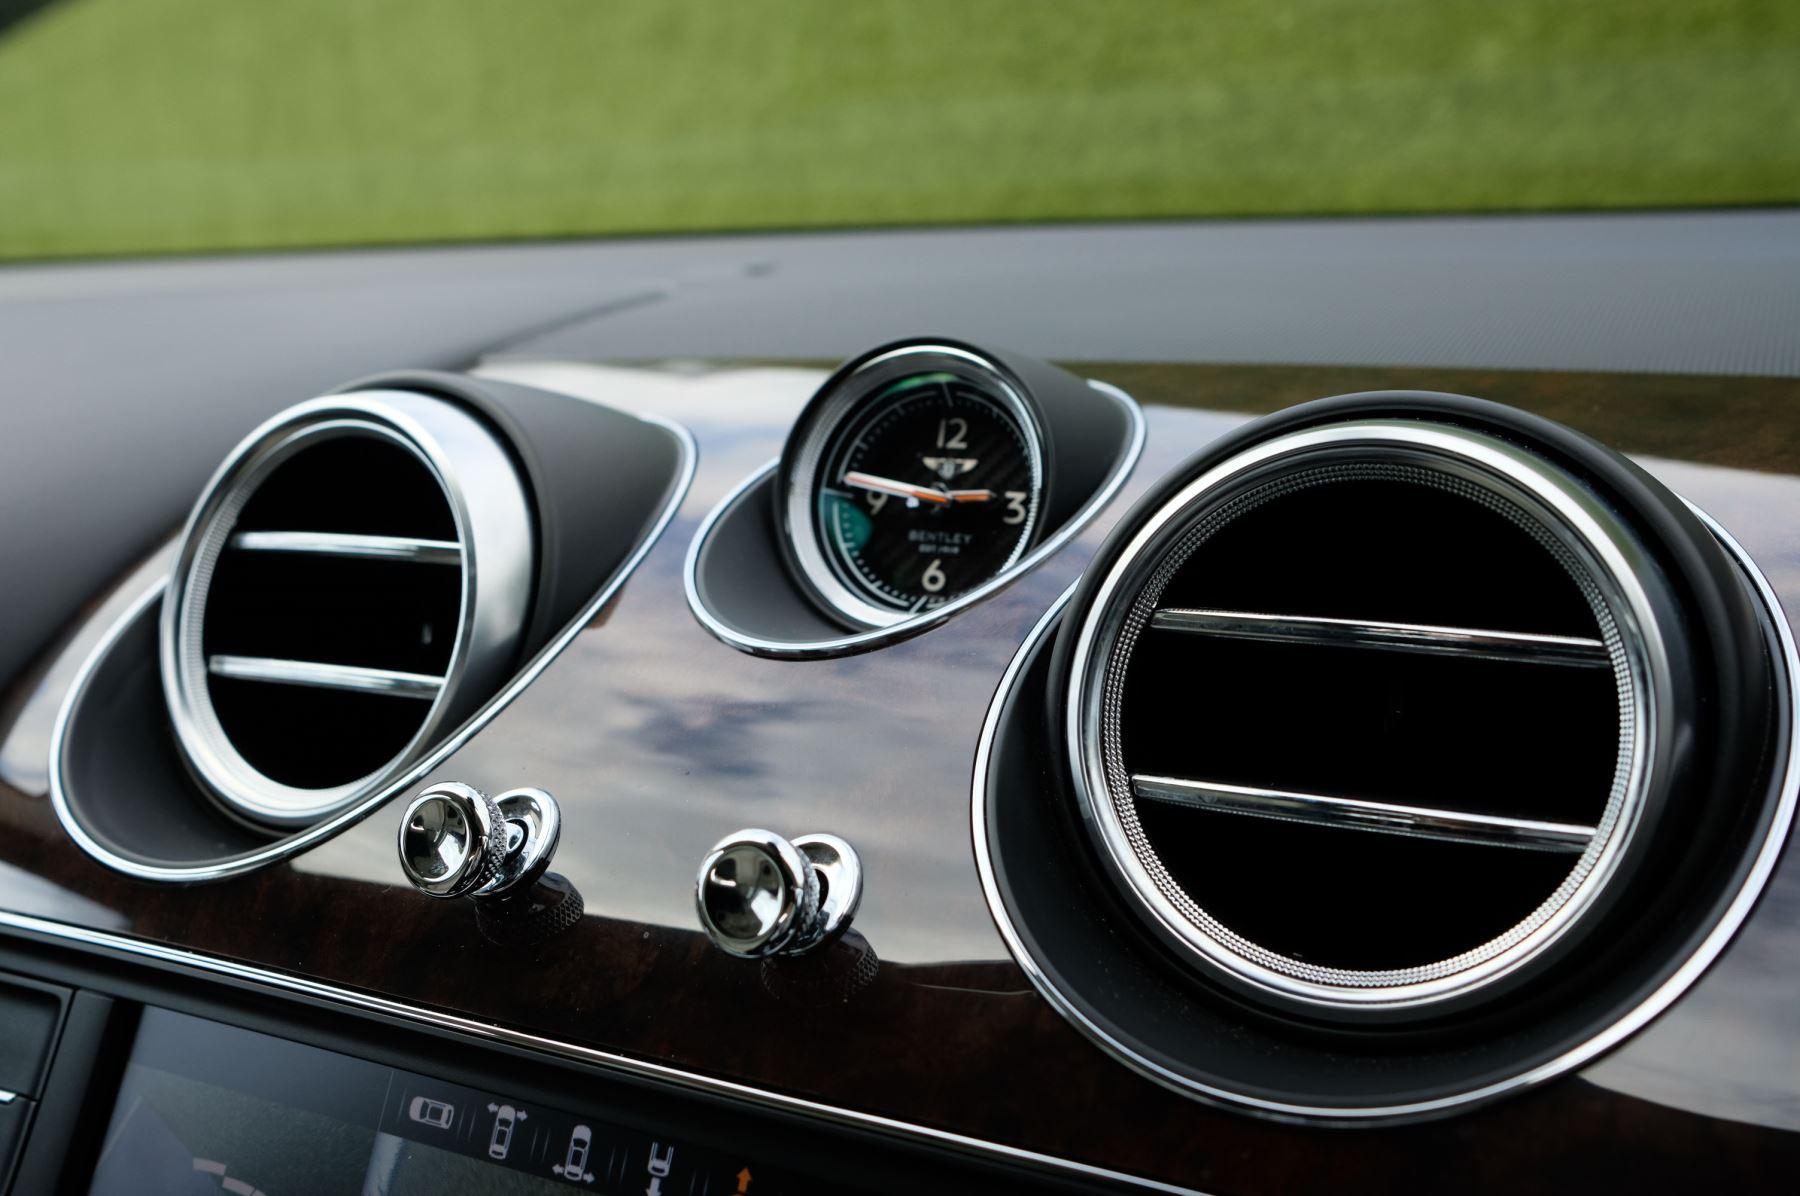 Bentley Bentayga 4.0 V8 5dr - Mulliner Driving Specification - City & Tour Specification image 21